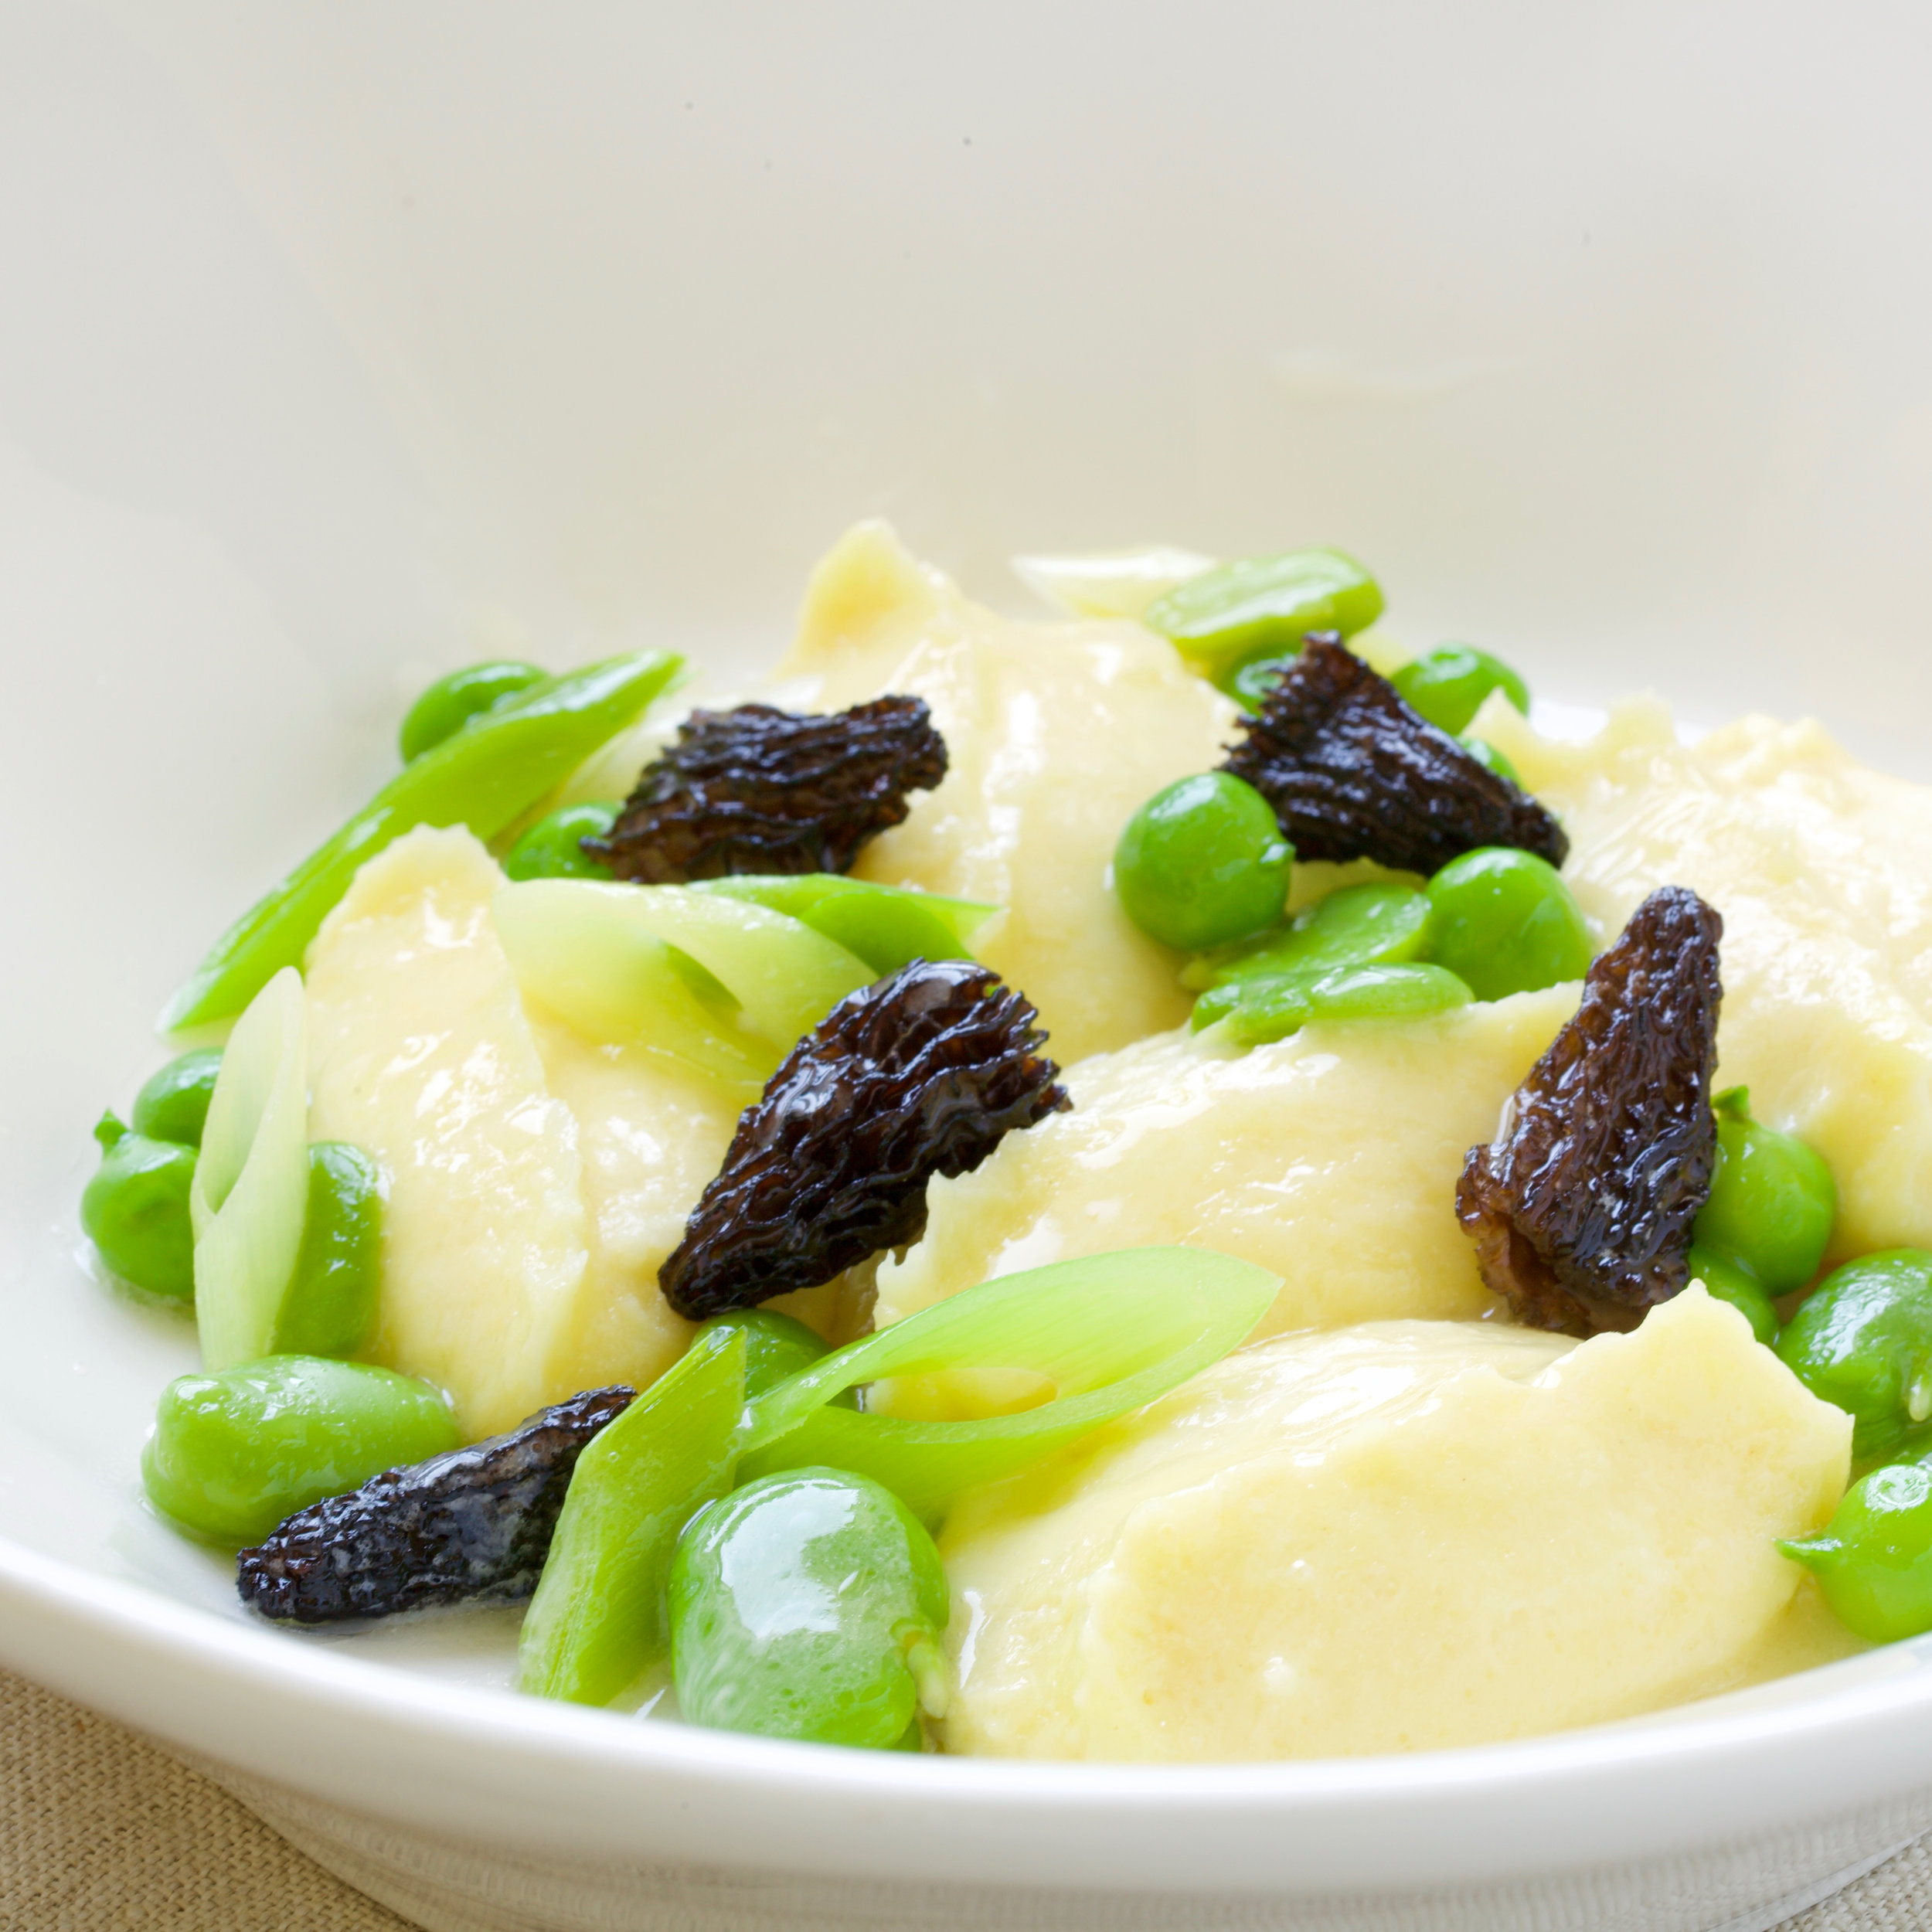 ricotta dumplings, morels, fava beans, leeks